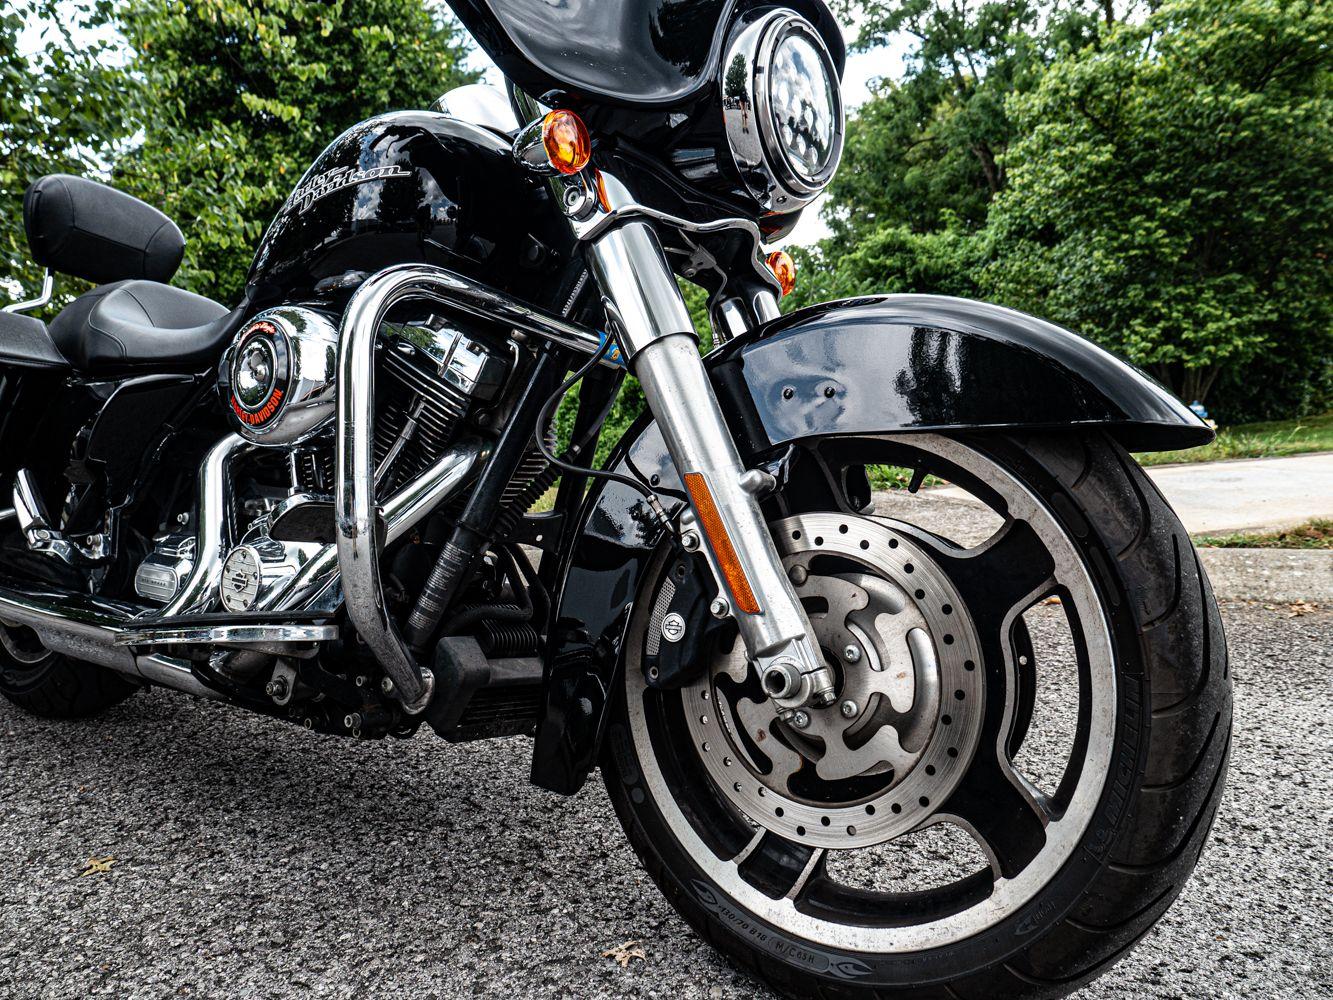 Pre-Owned 2012 Harley-Davidson Street Glide